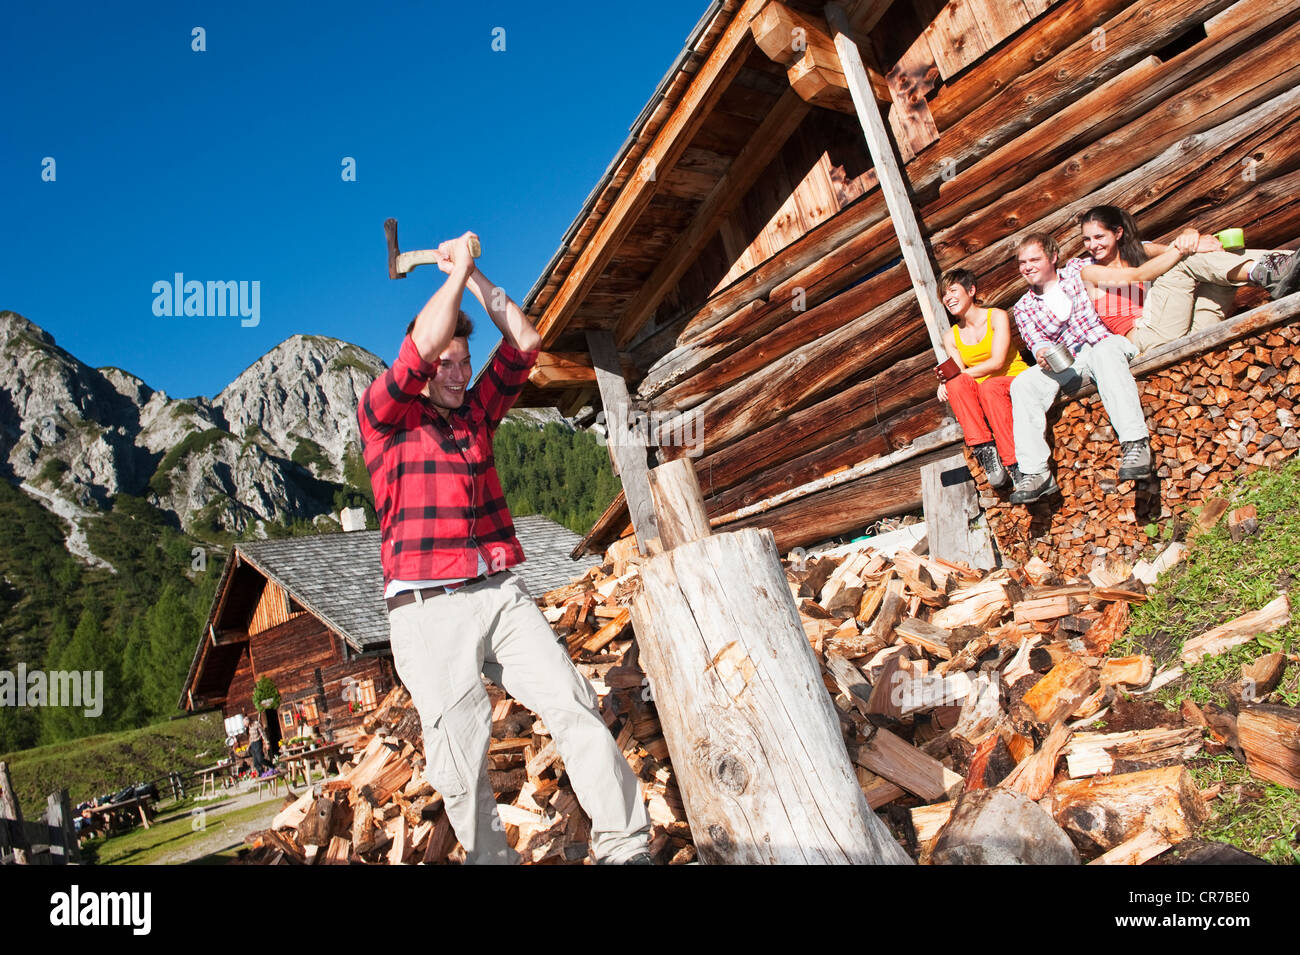 Austria, Salzburg County, Friends looking at man chopping wood near alpine hut Stock Photo